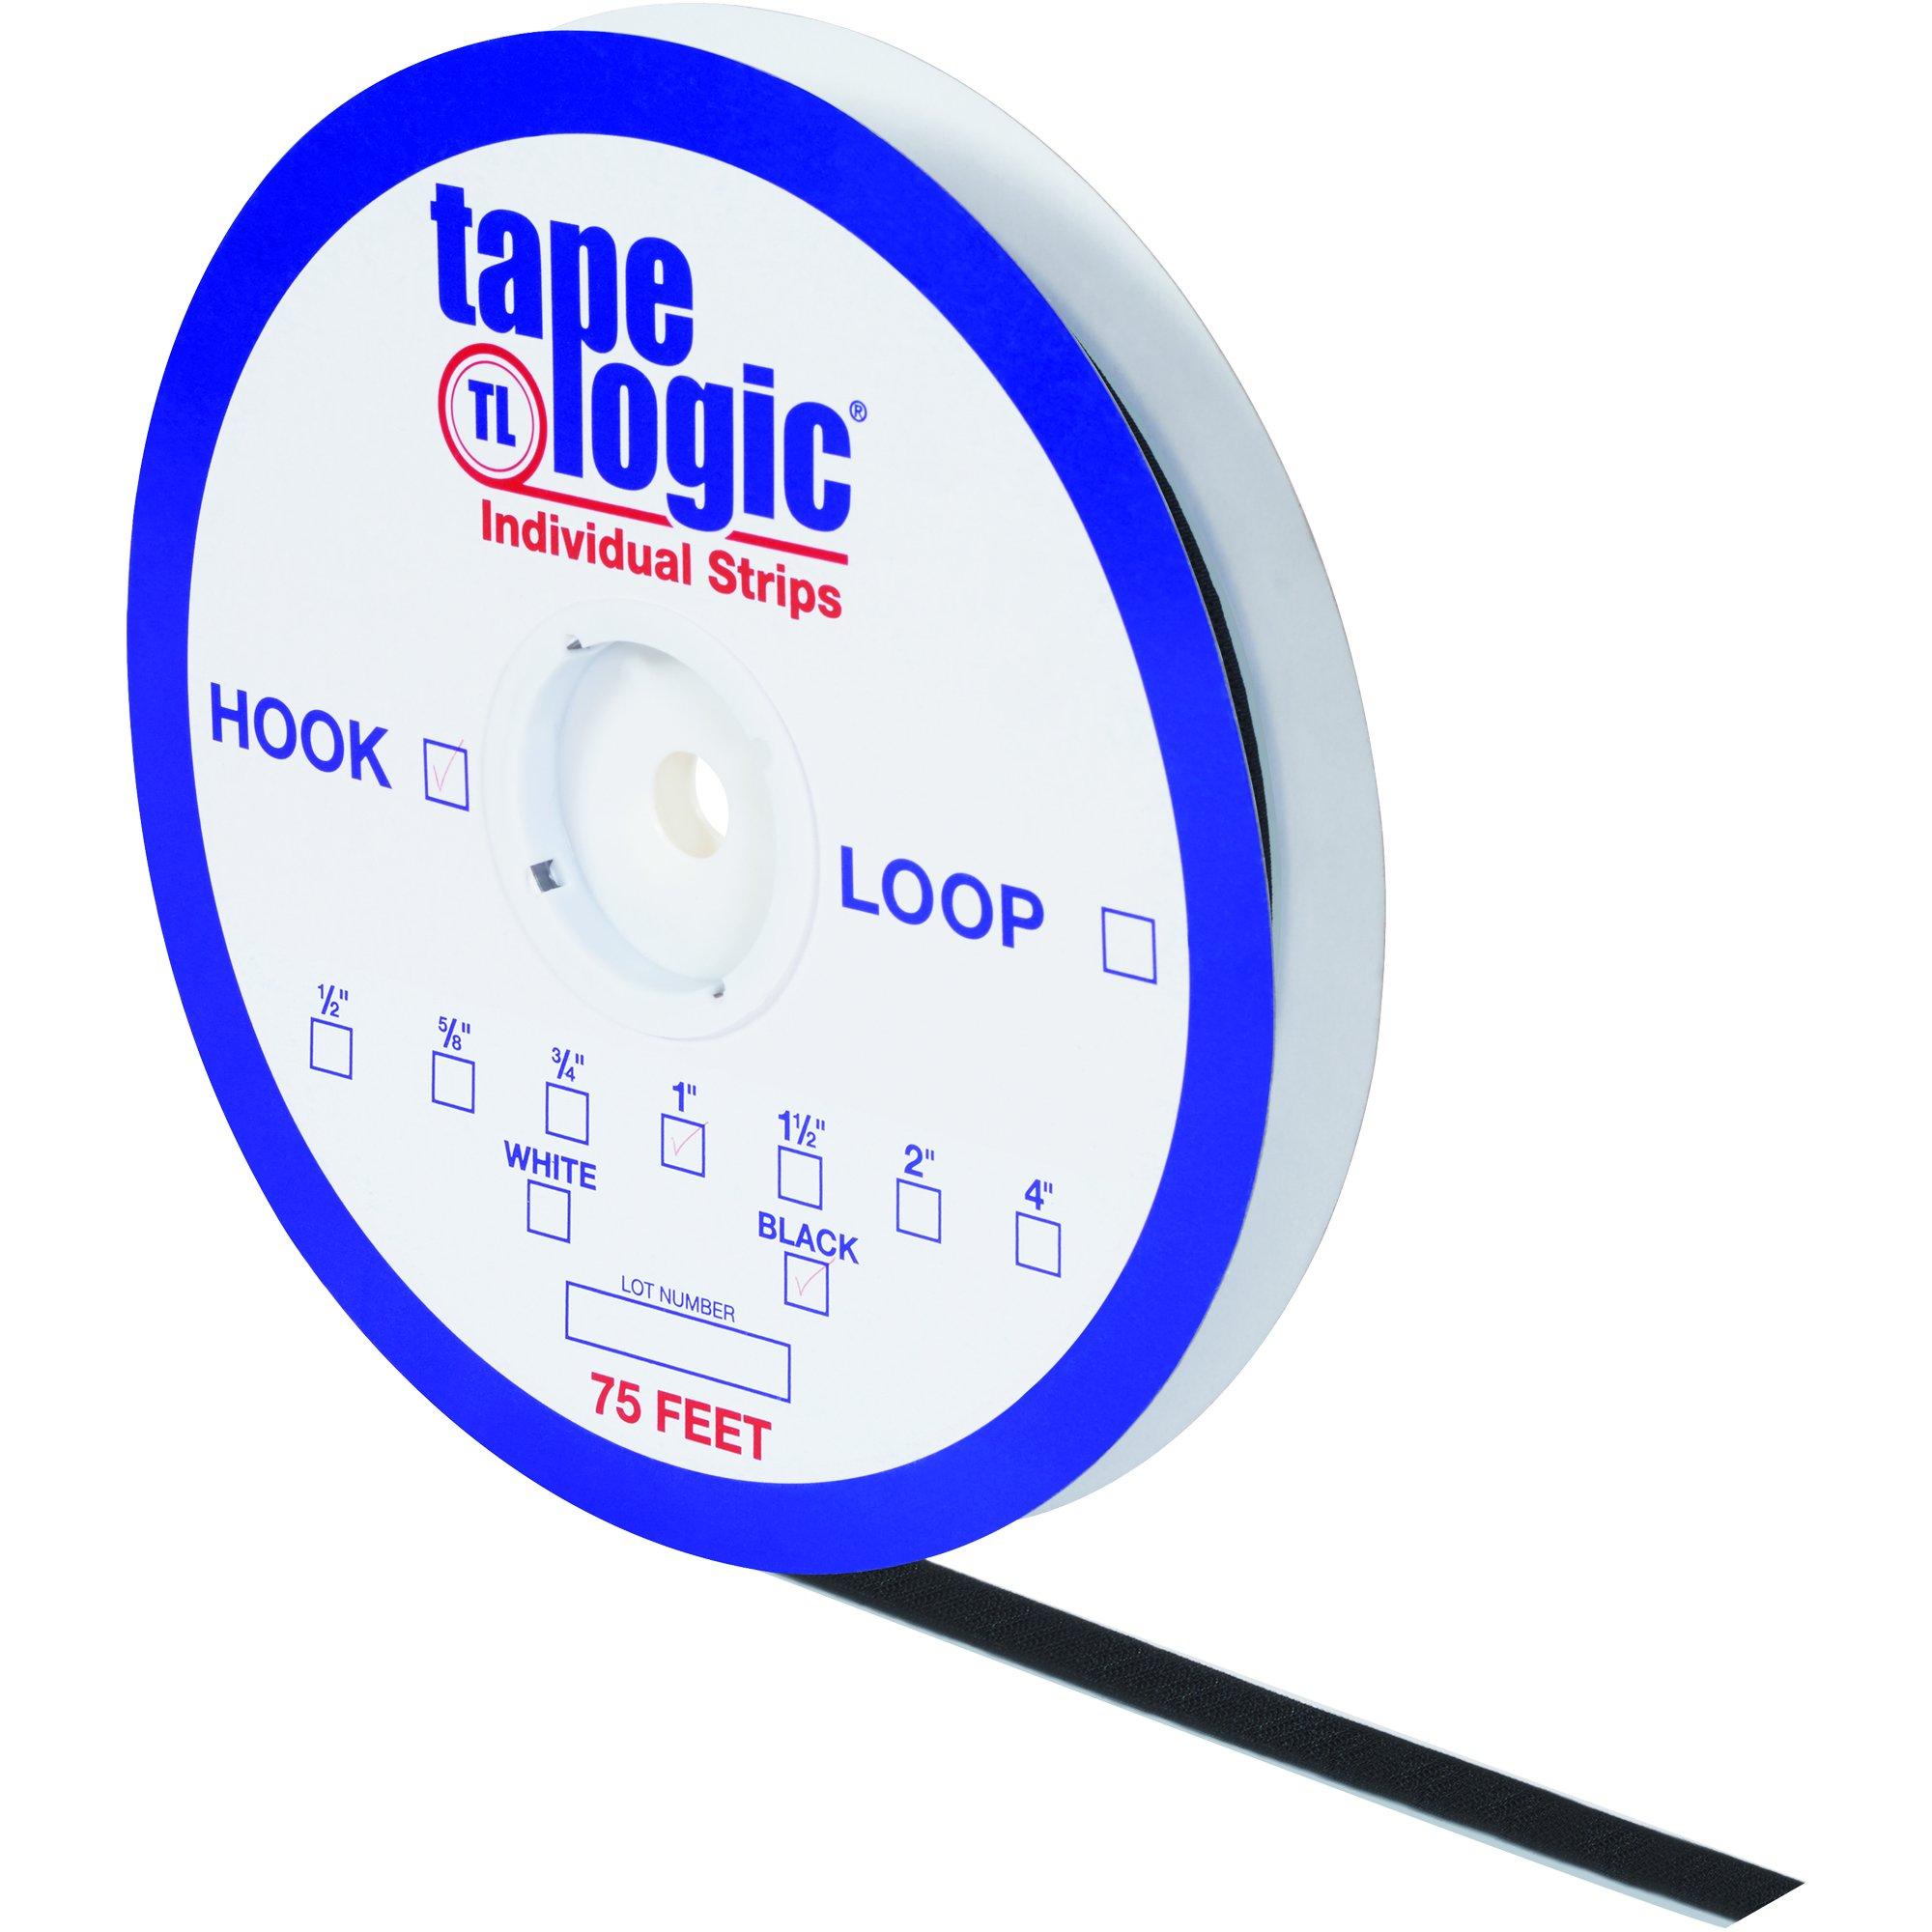 Tape Logic HLT114 Rubber Based Individual Tape Loop Strip, 75' Length x 1'' Width, Black